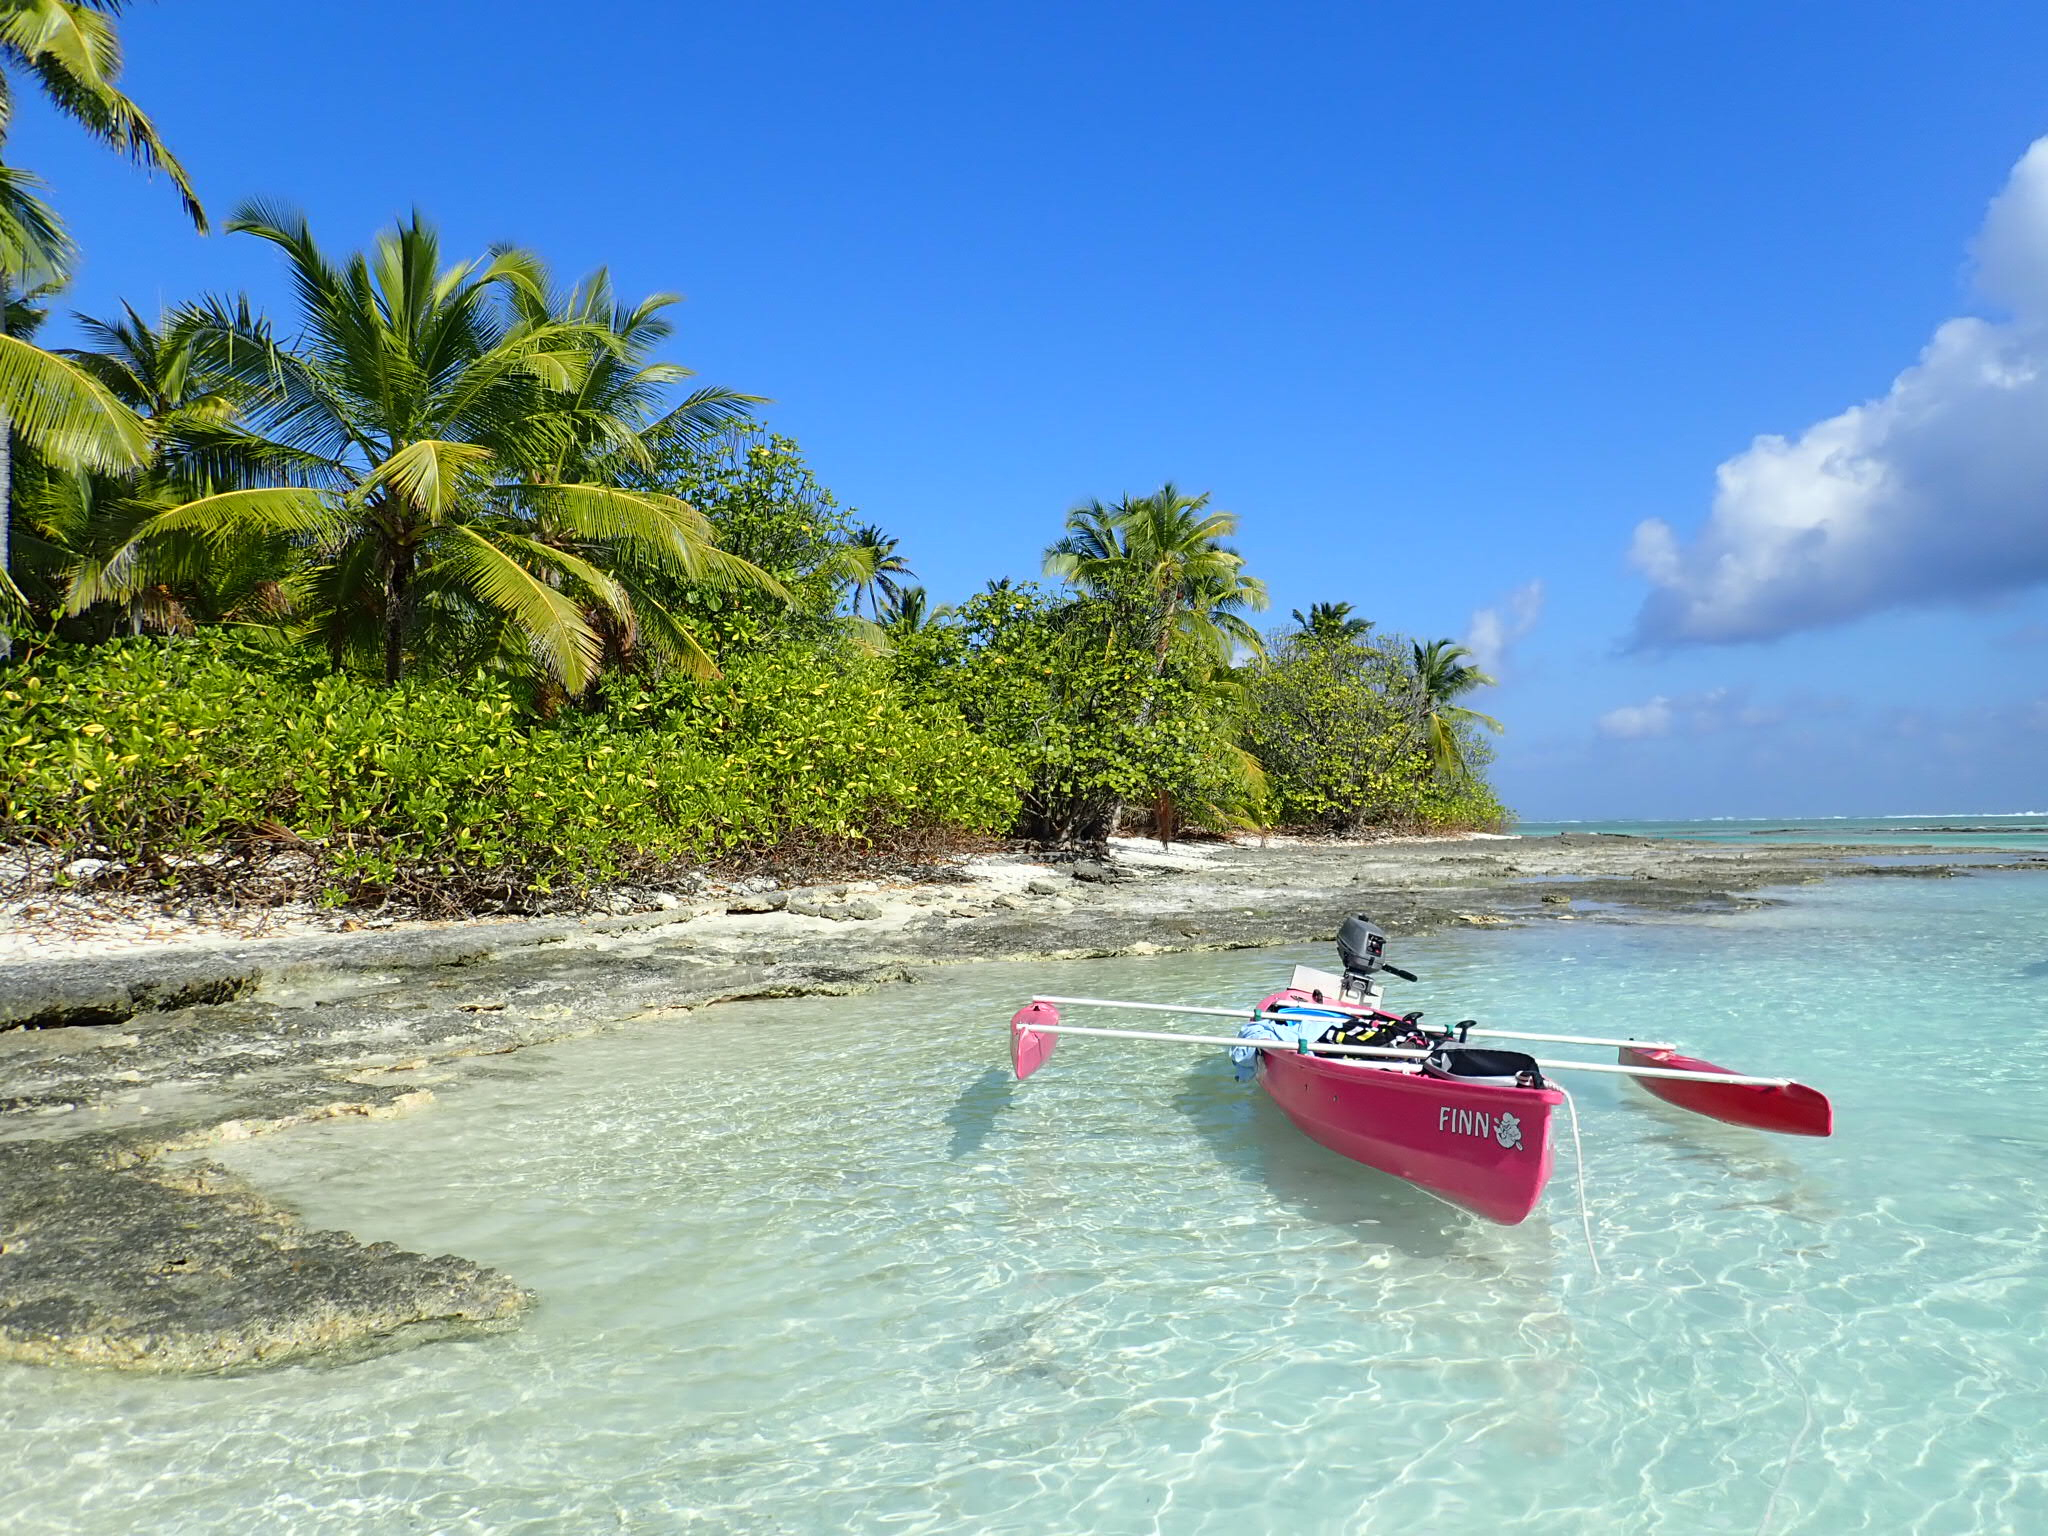 Motorised Kayaks - great for exploring the uninhabited islands